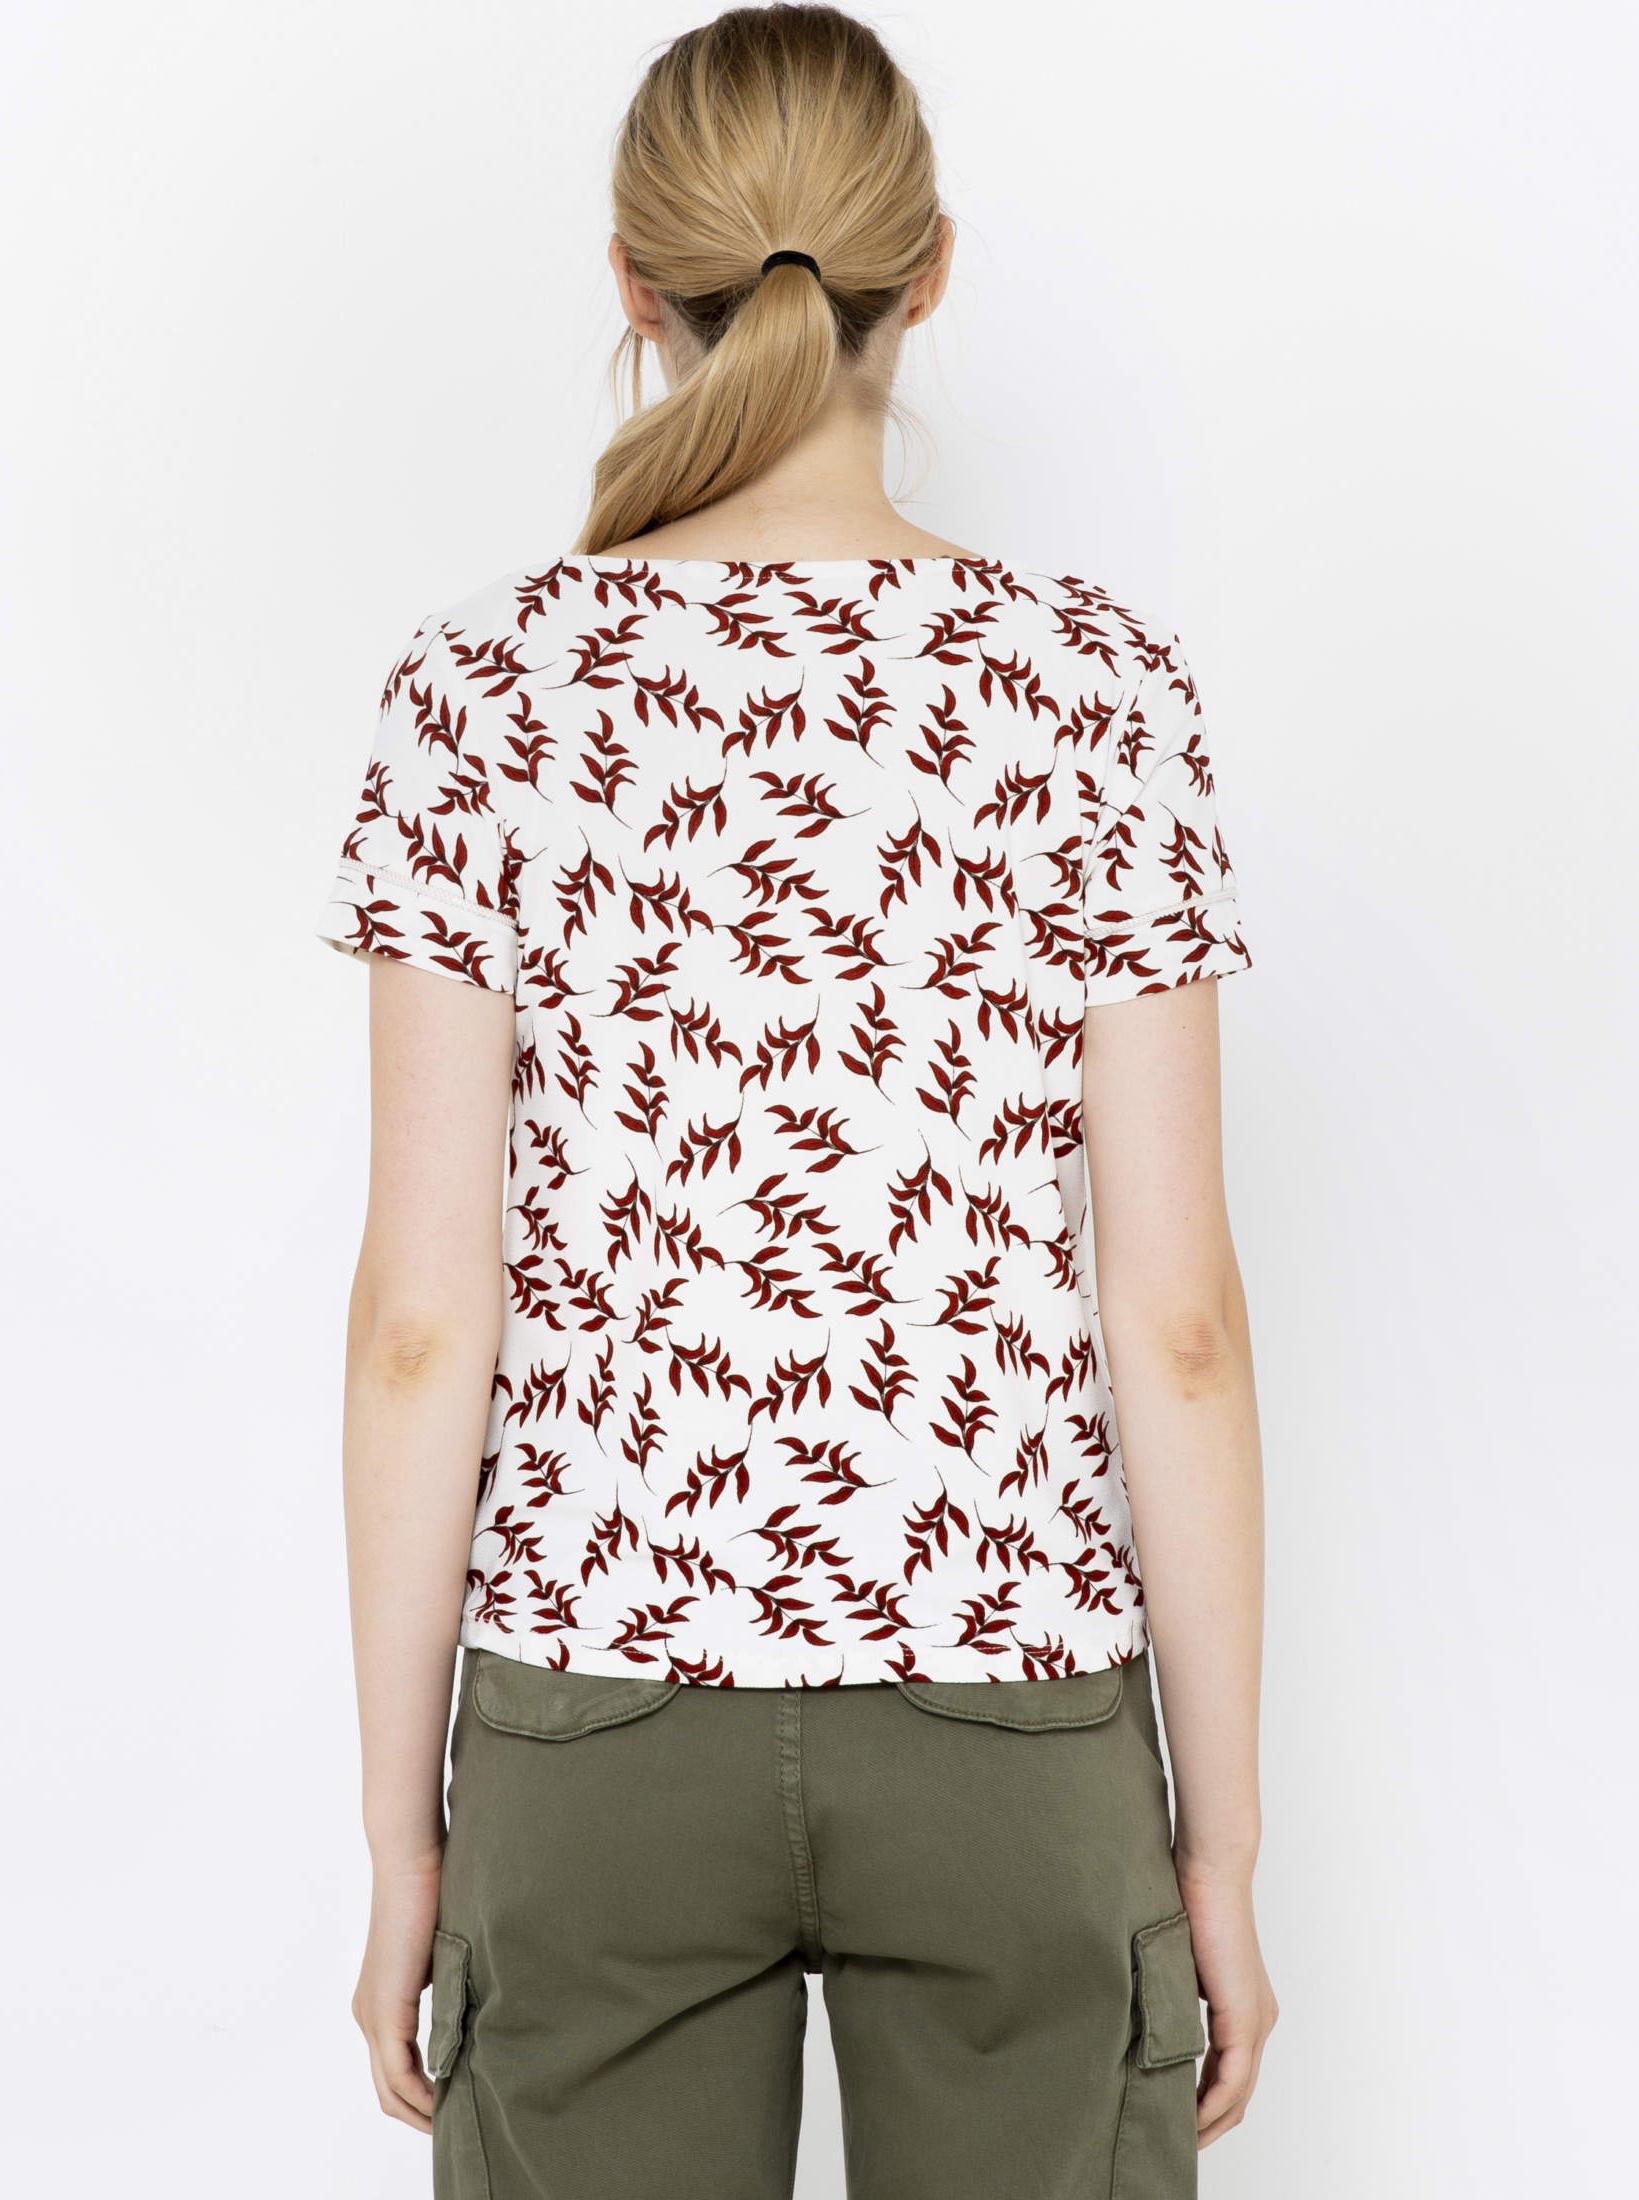 CAMAIEU white T-shirt with pattern